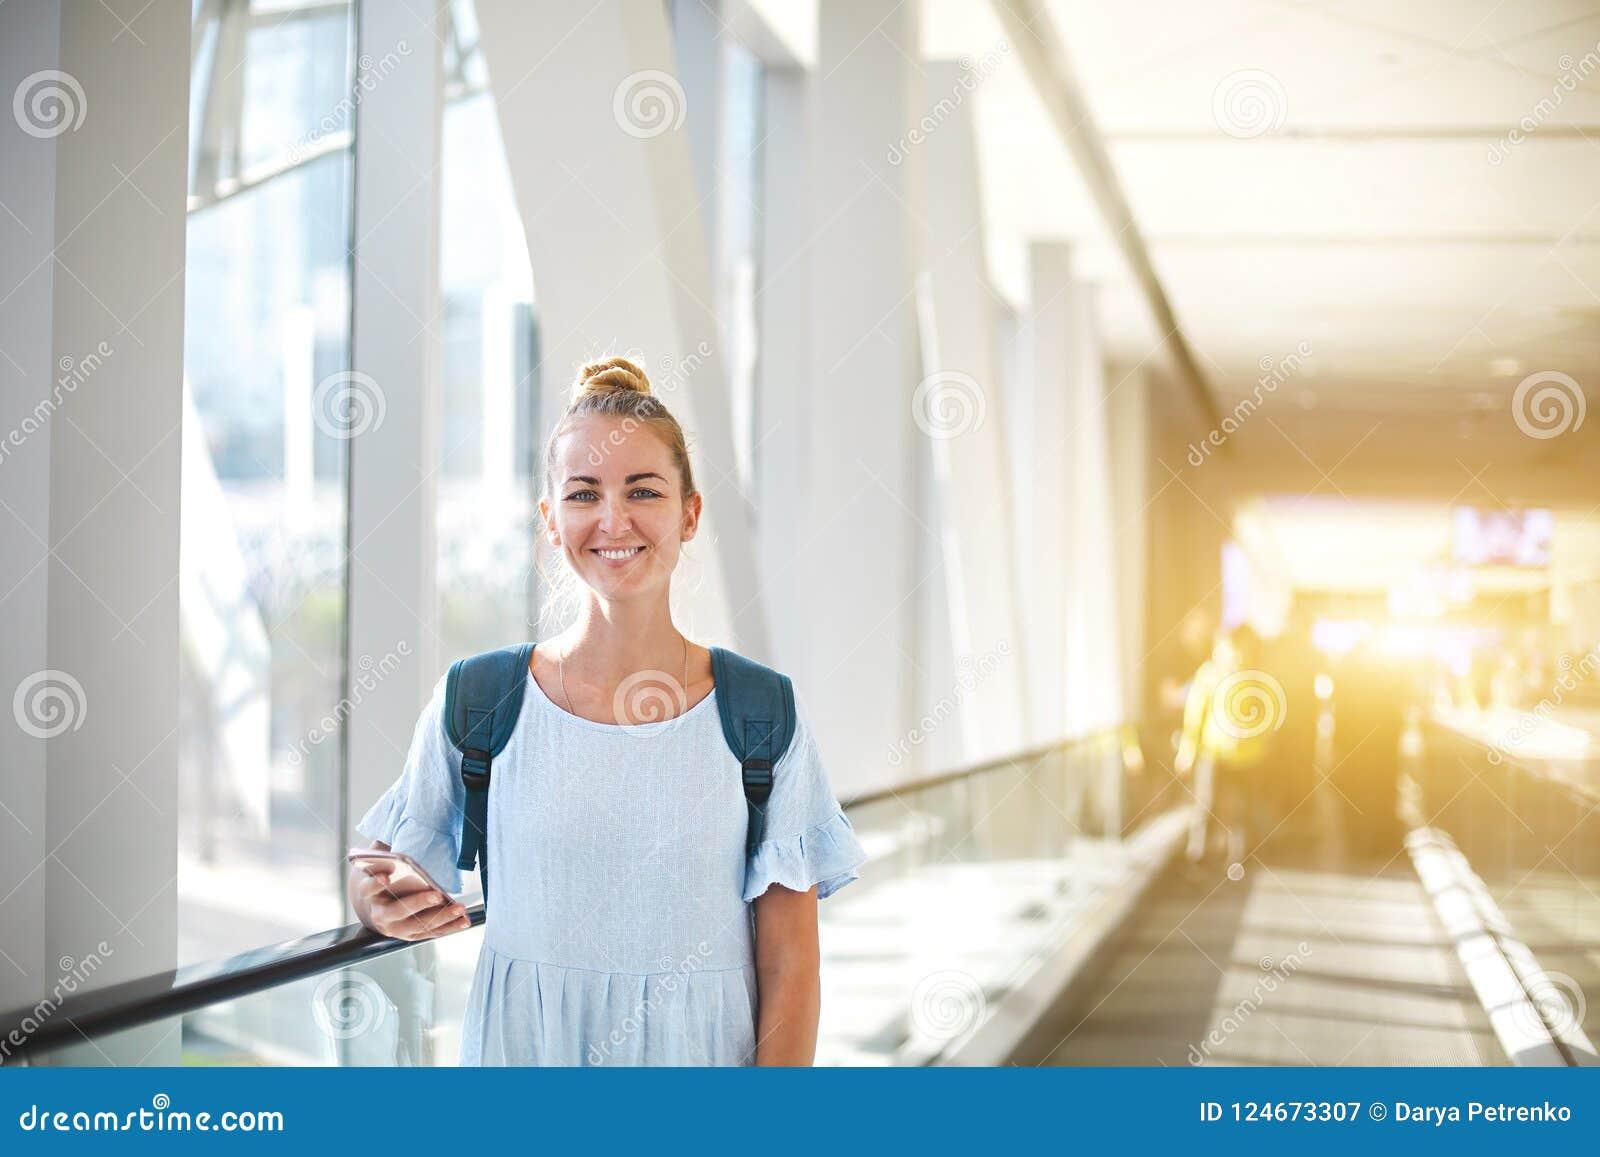 Beautiful young woman traveling in metro